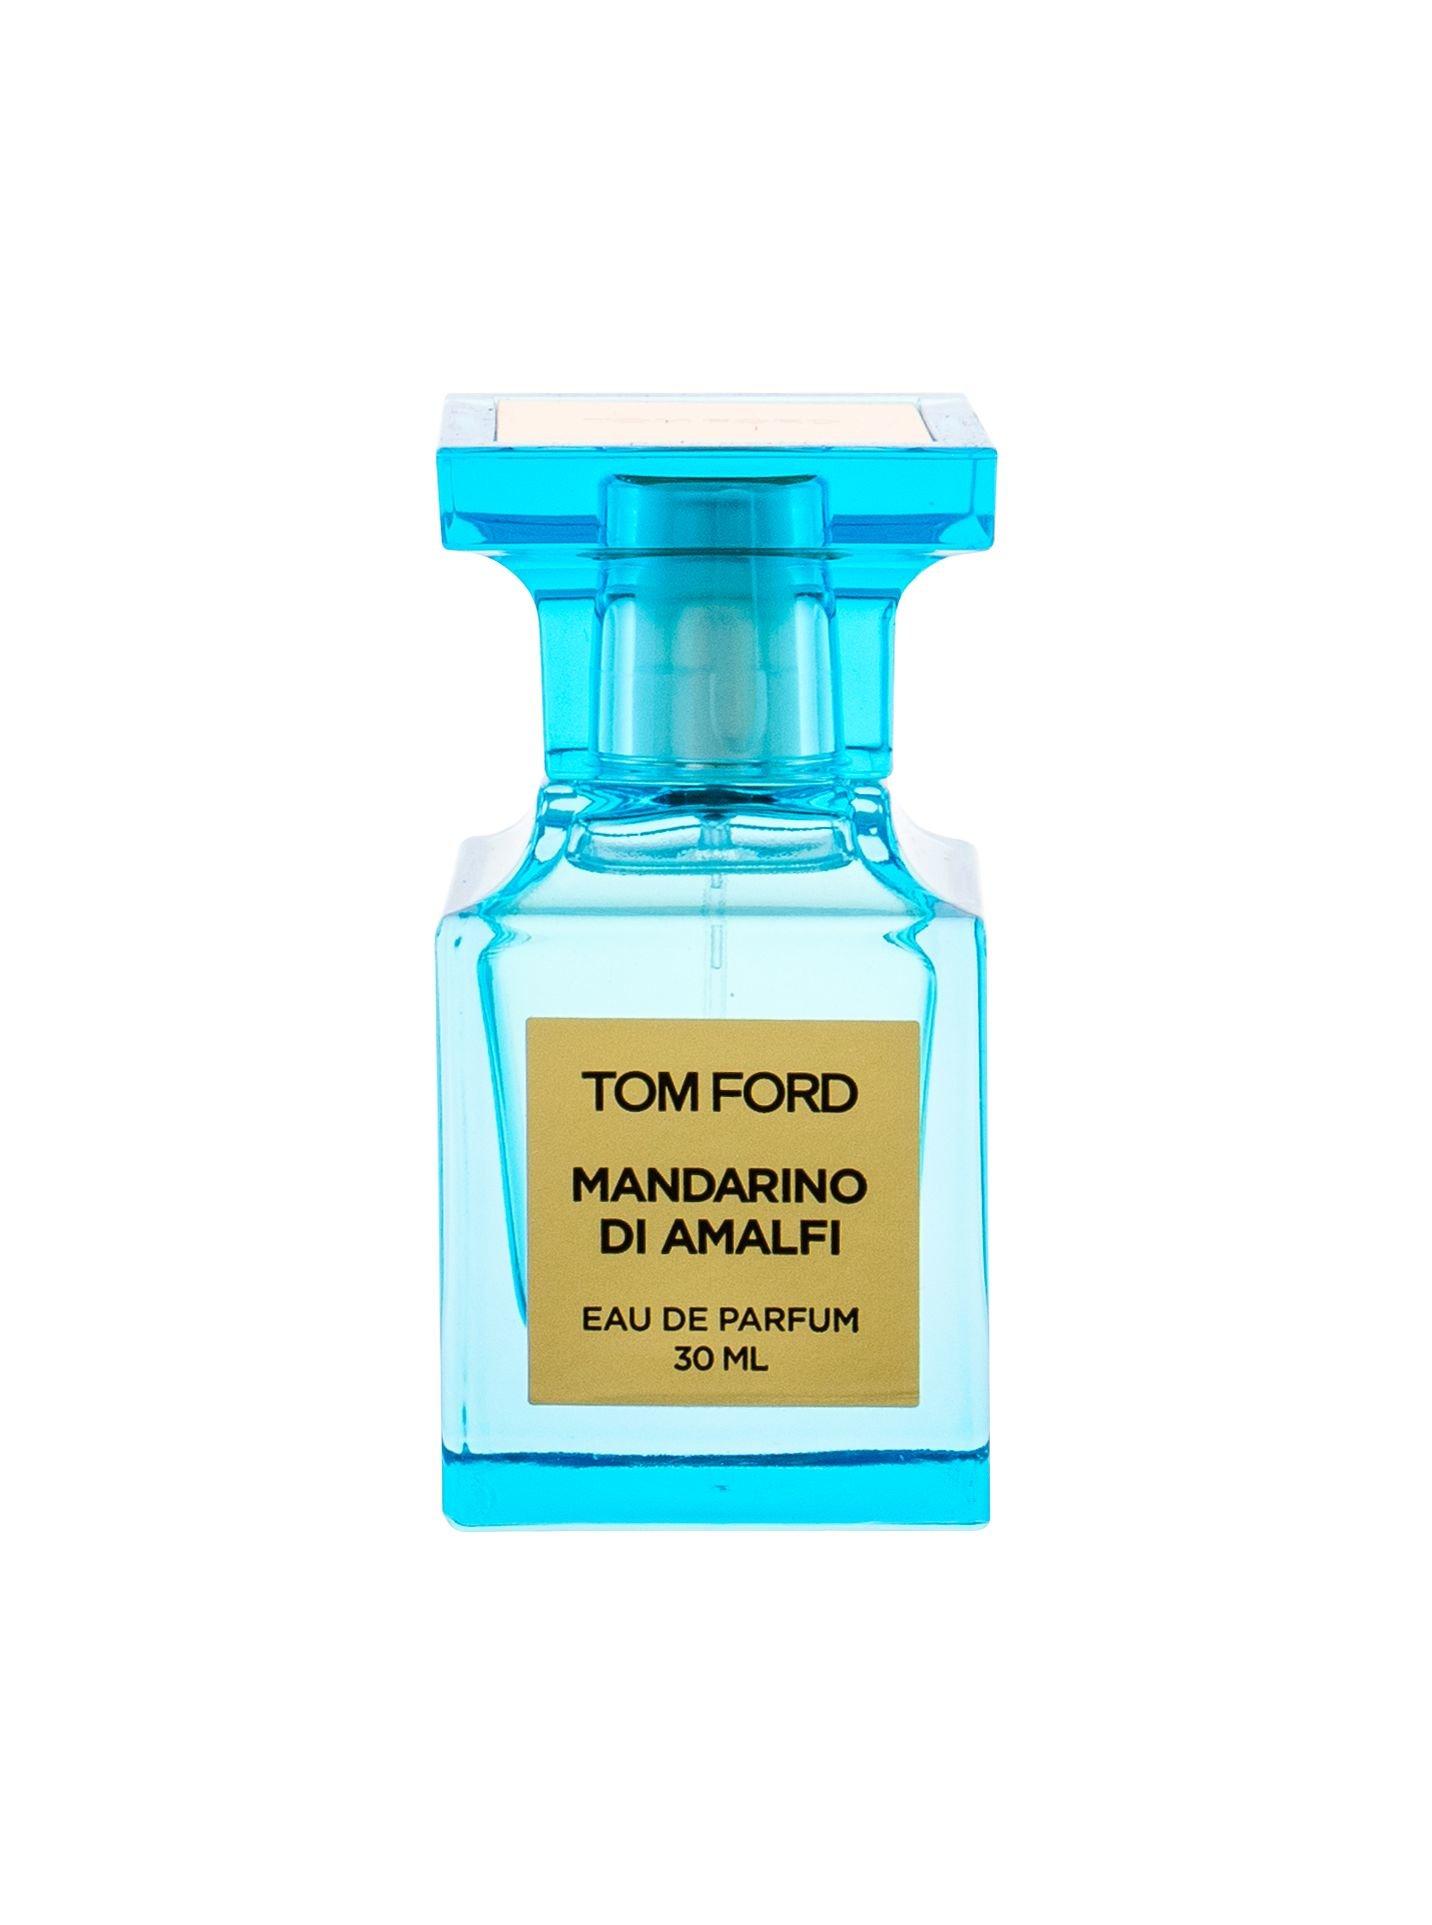 TOM FORD Mandarino di Amalfi Eau de Parfum 30ml